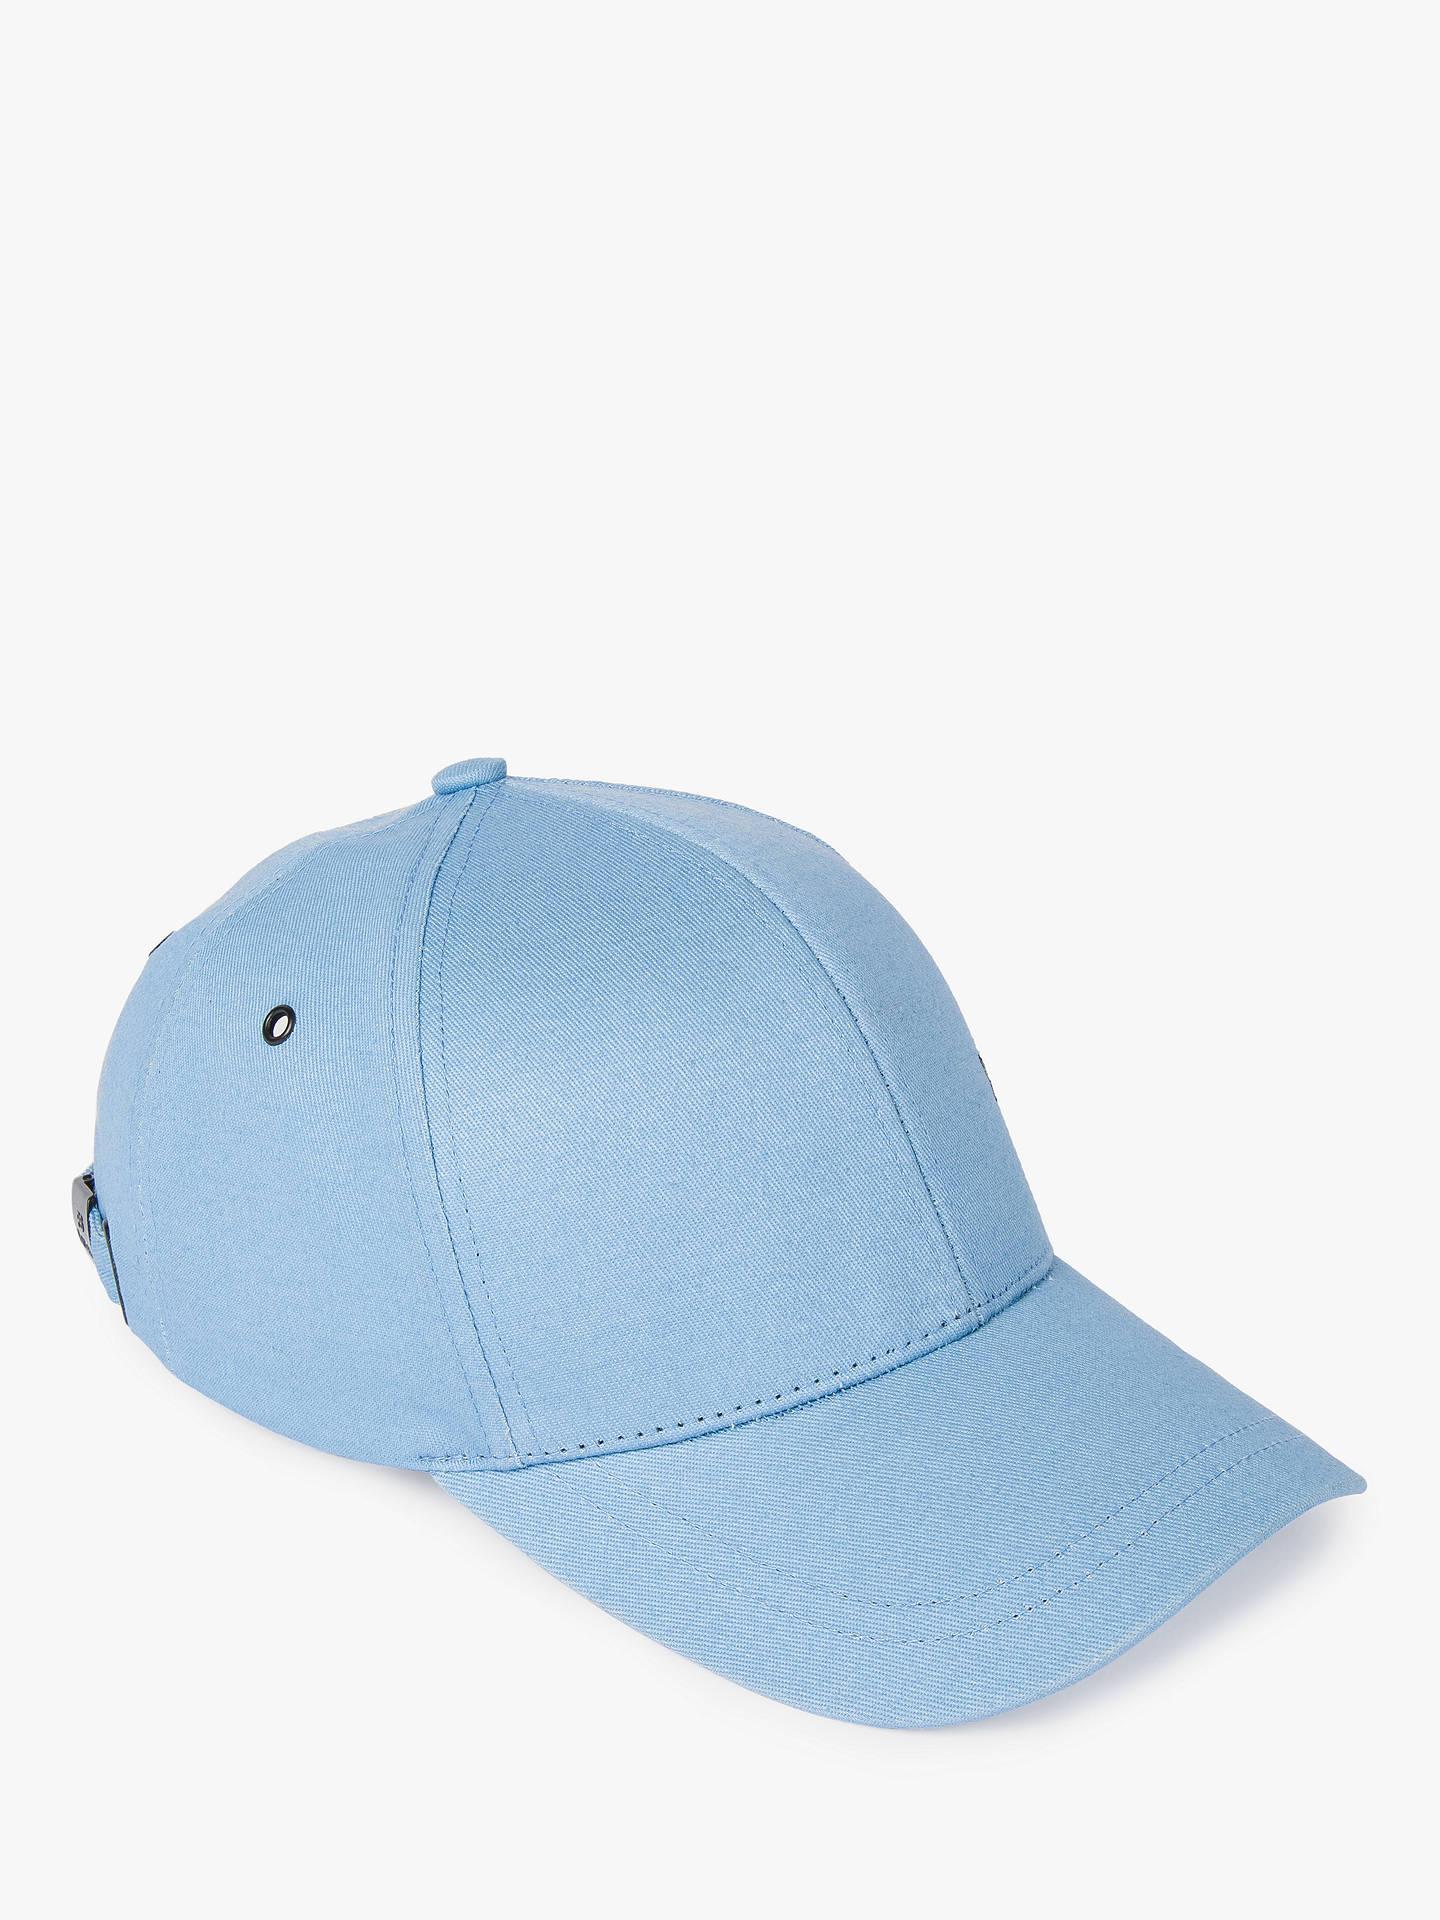 7f853bab2f9 ... BuyPaul Smith Zebra Baseball Cap